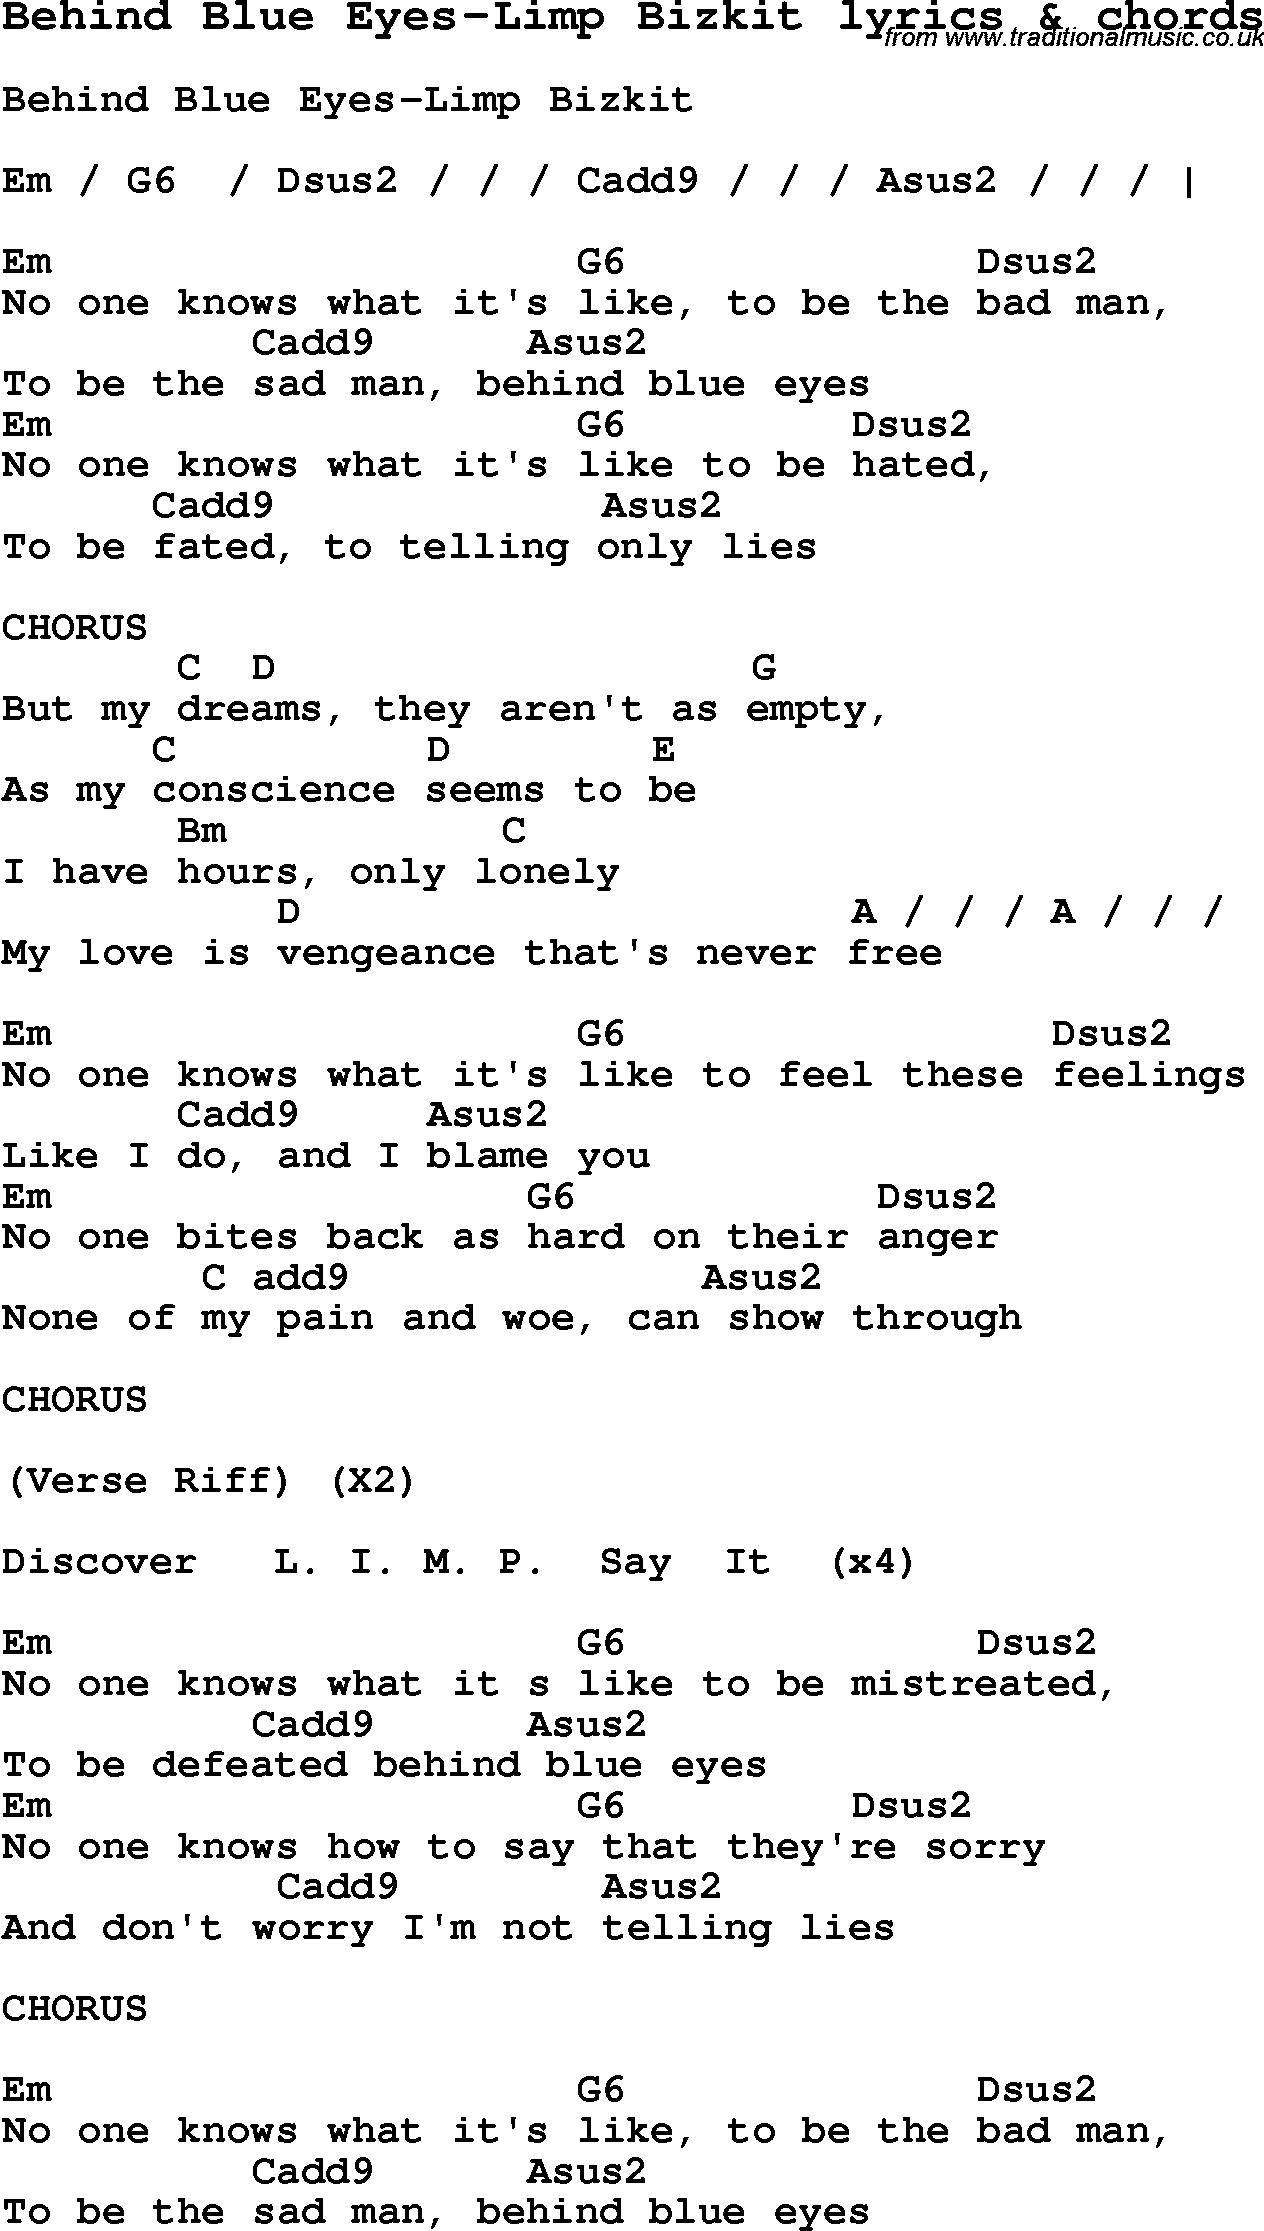 Love Song Lyrics for: Behind Blue Eyes-Limp Bizkit with chords for Ukulele. Guitar Banjo etc. | Guitar chords for songs. Song lyrics and chords